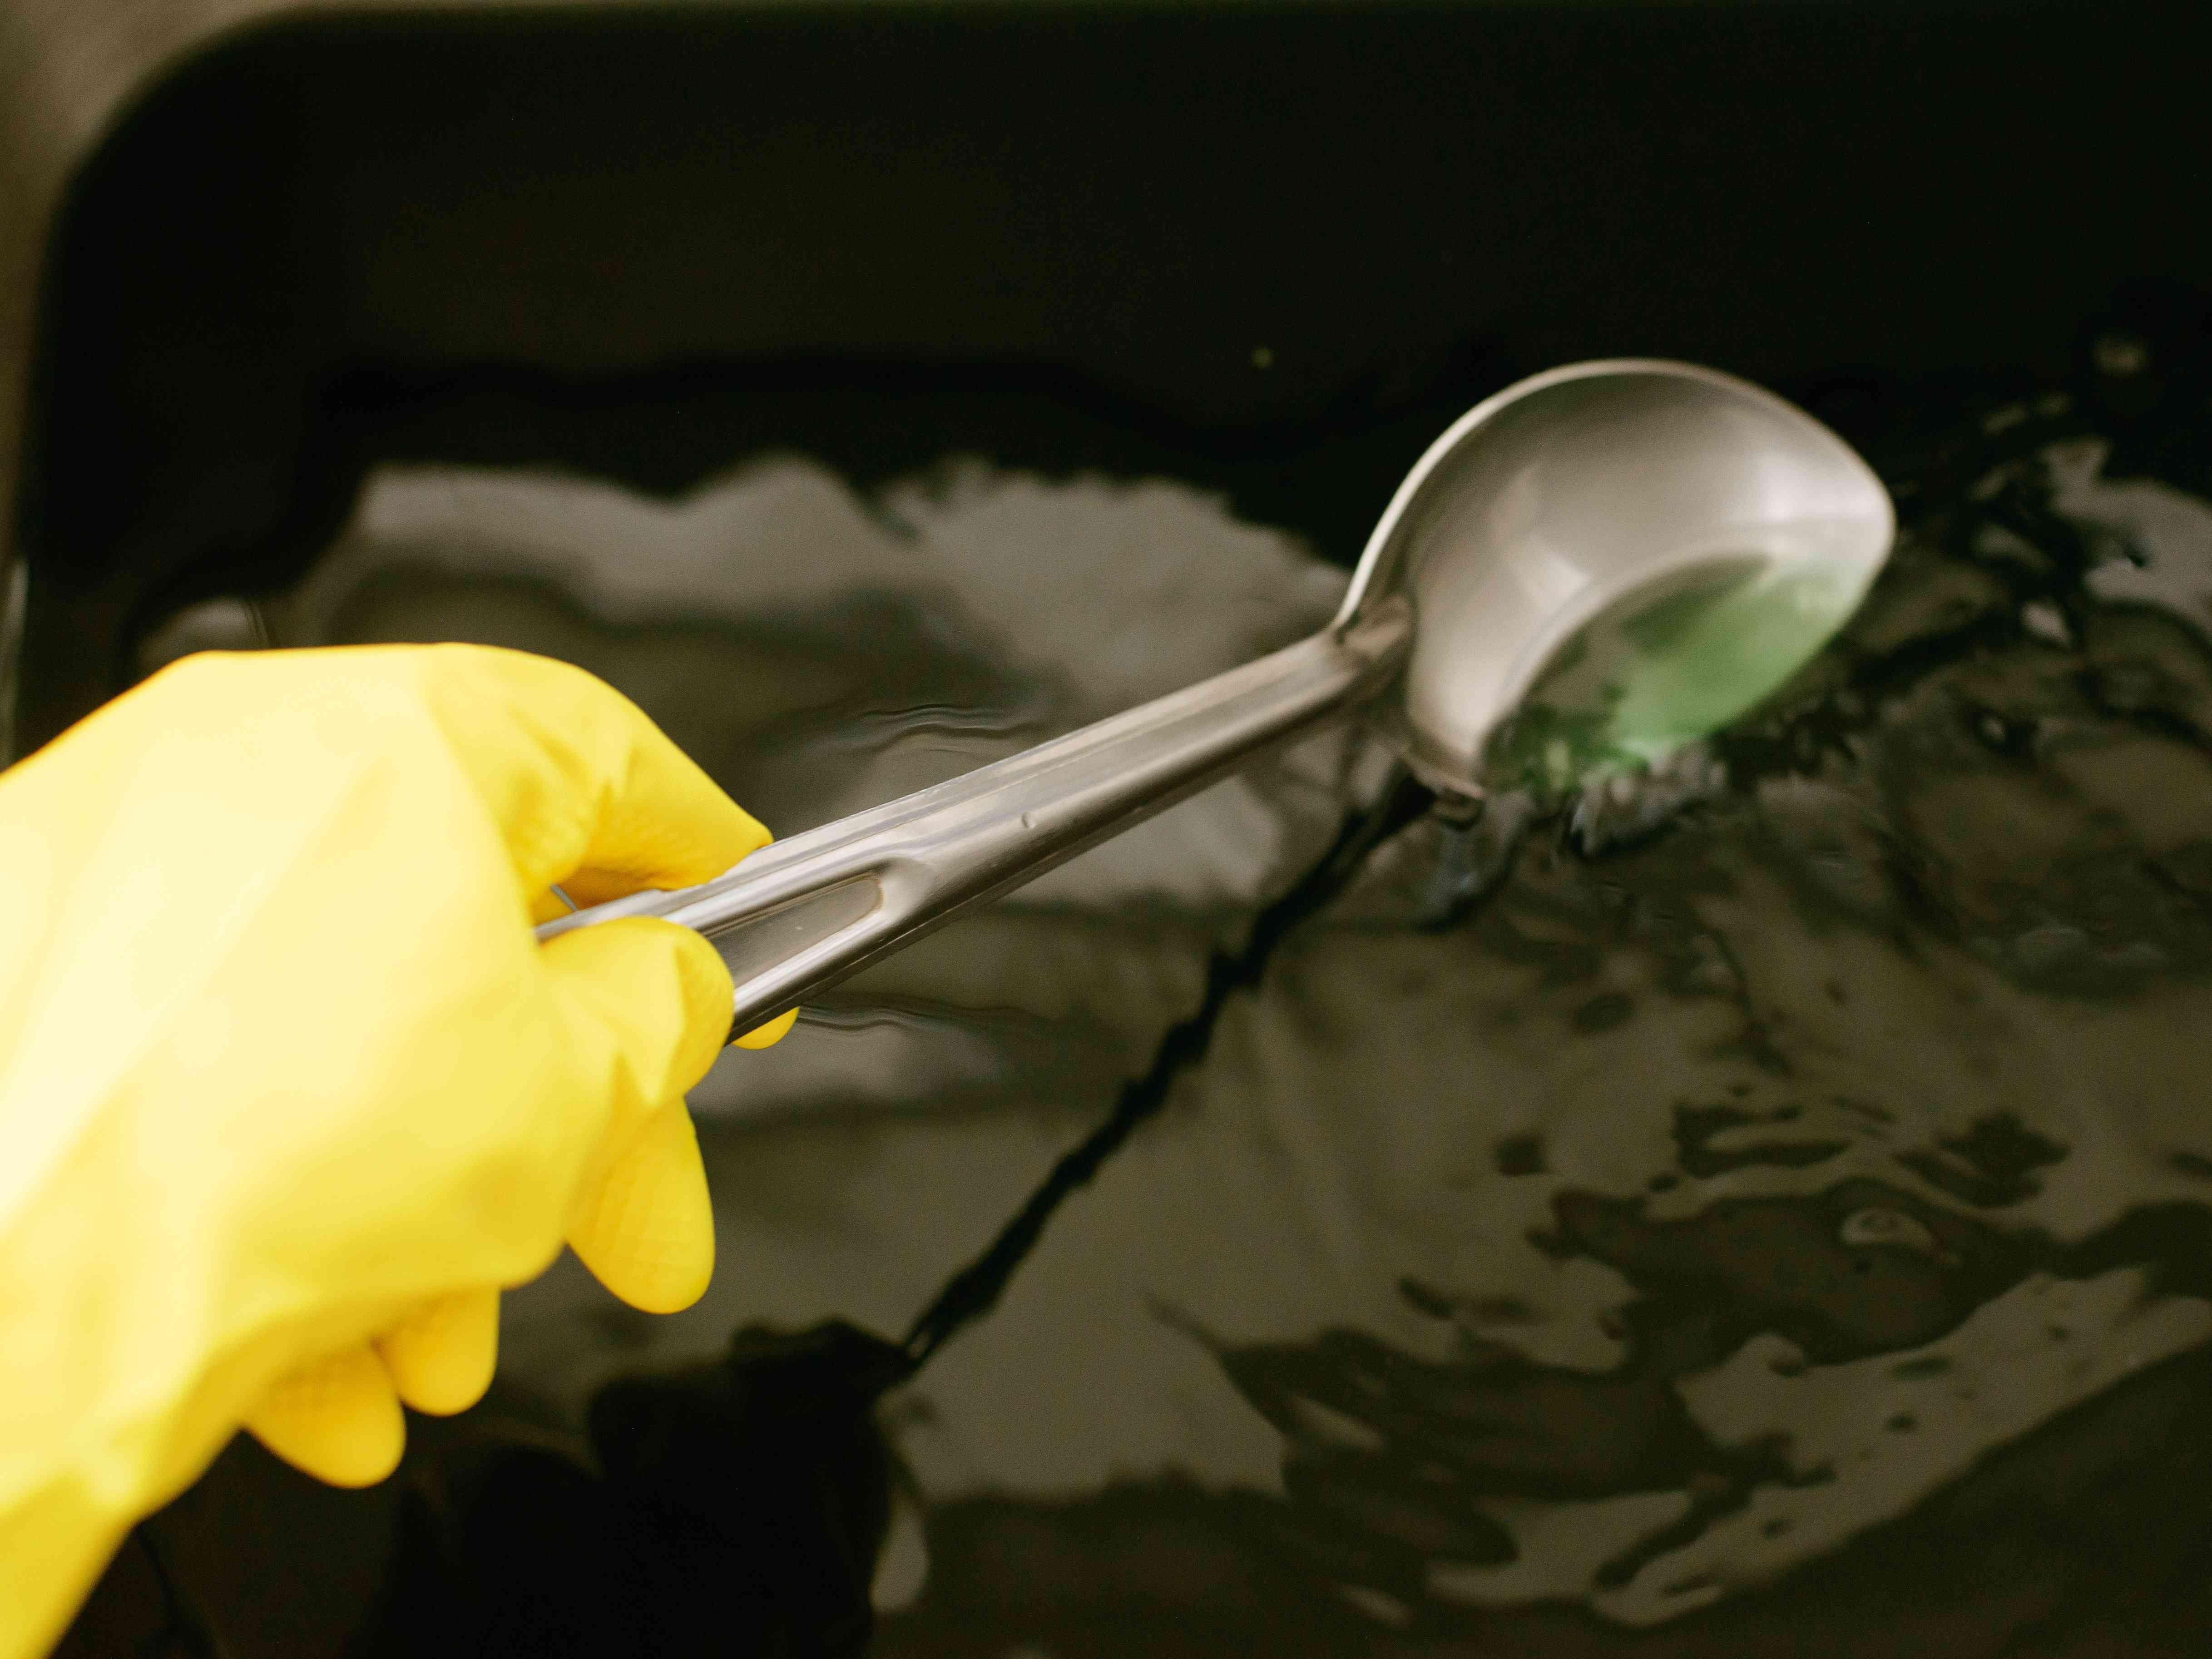 Metal spoon mixing fabric dye in sink